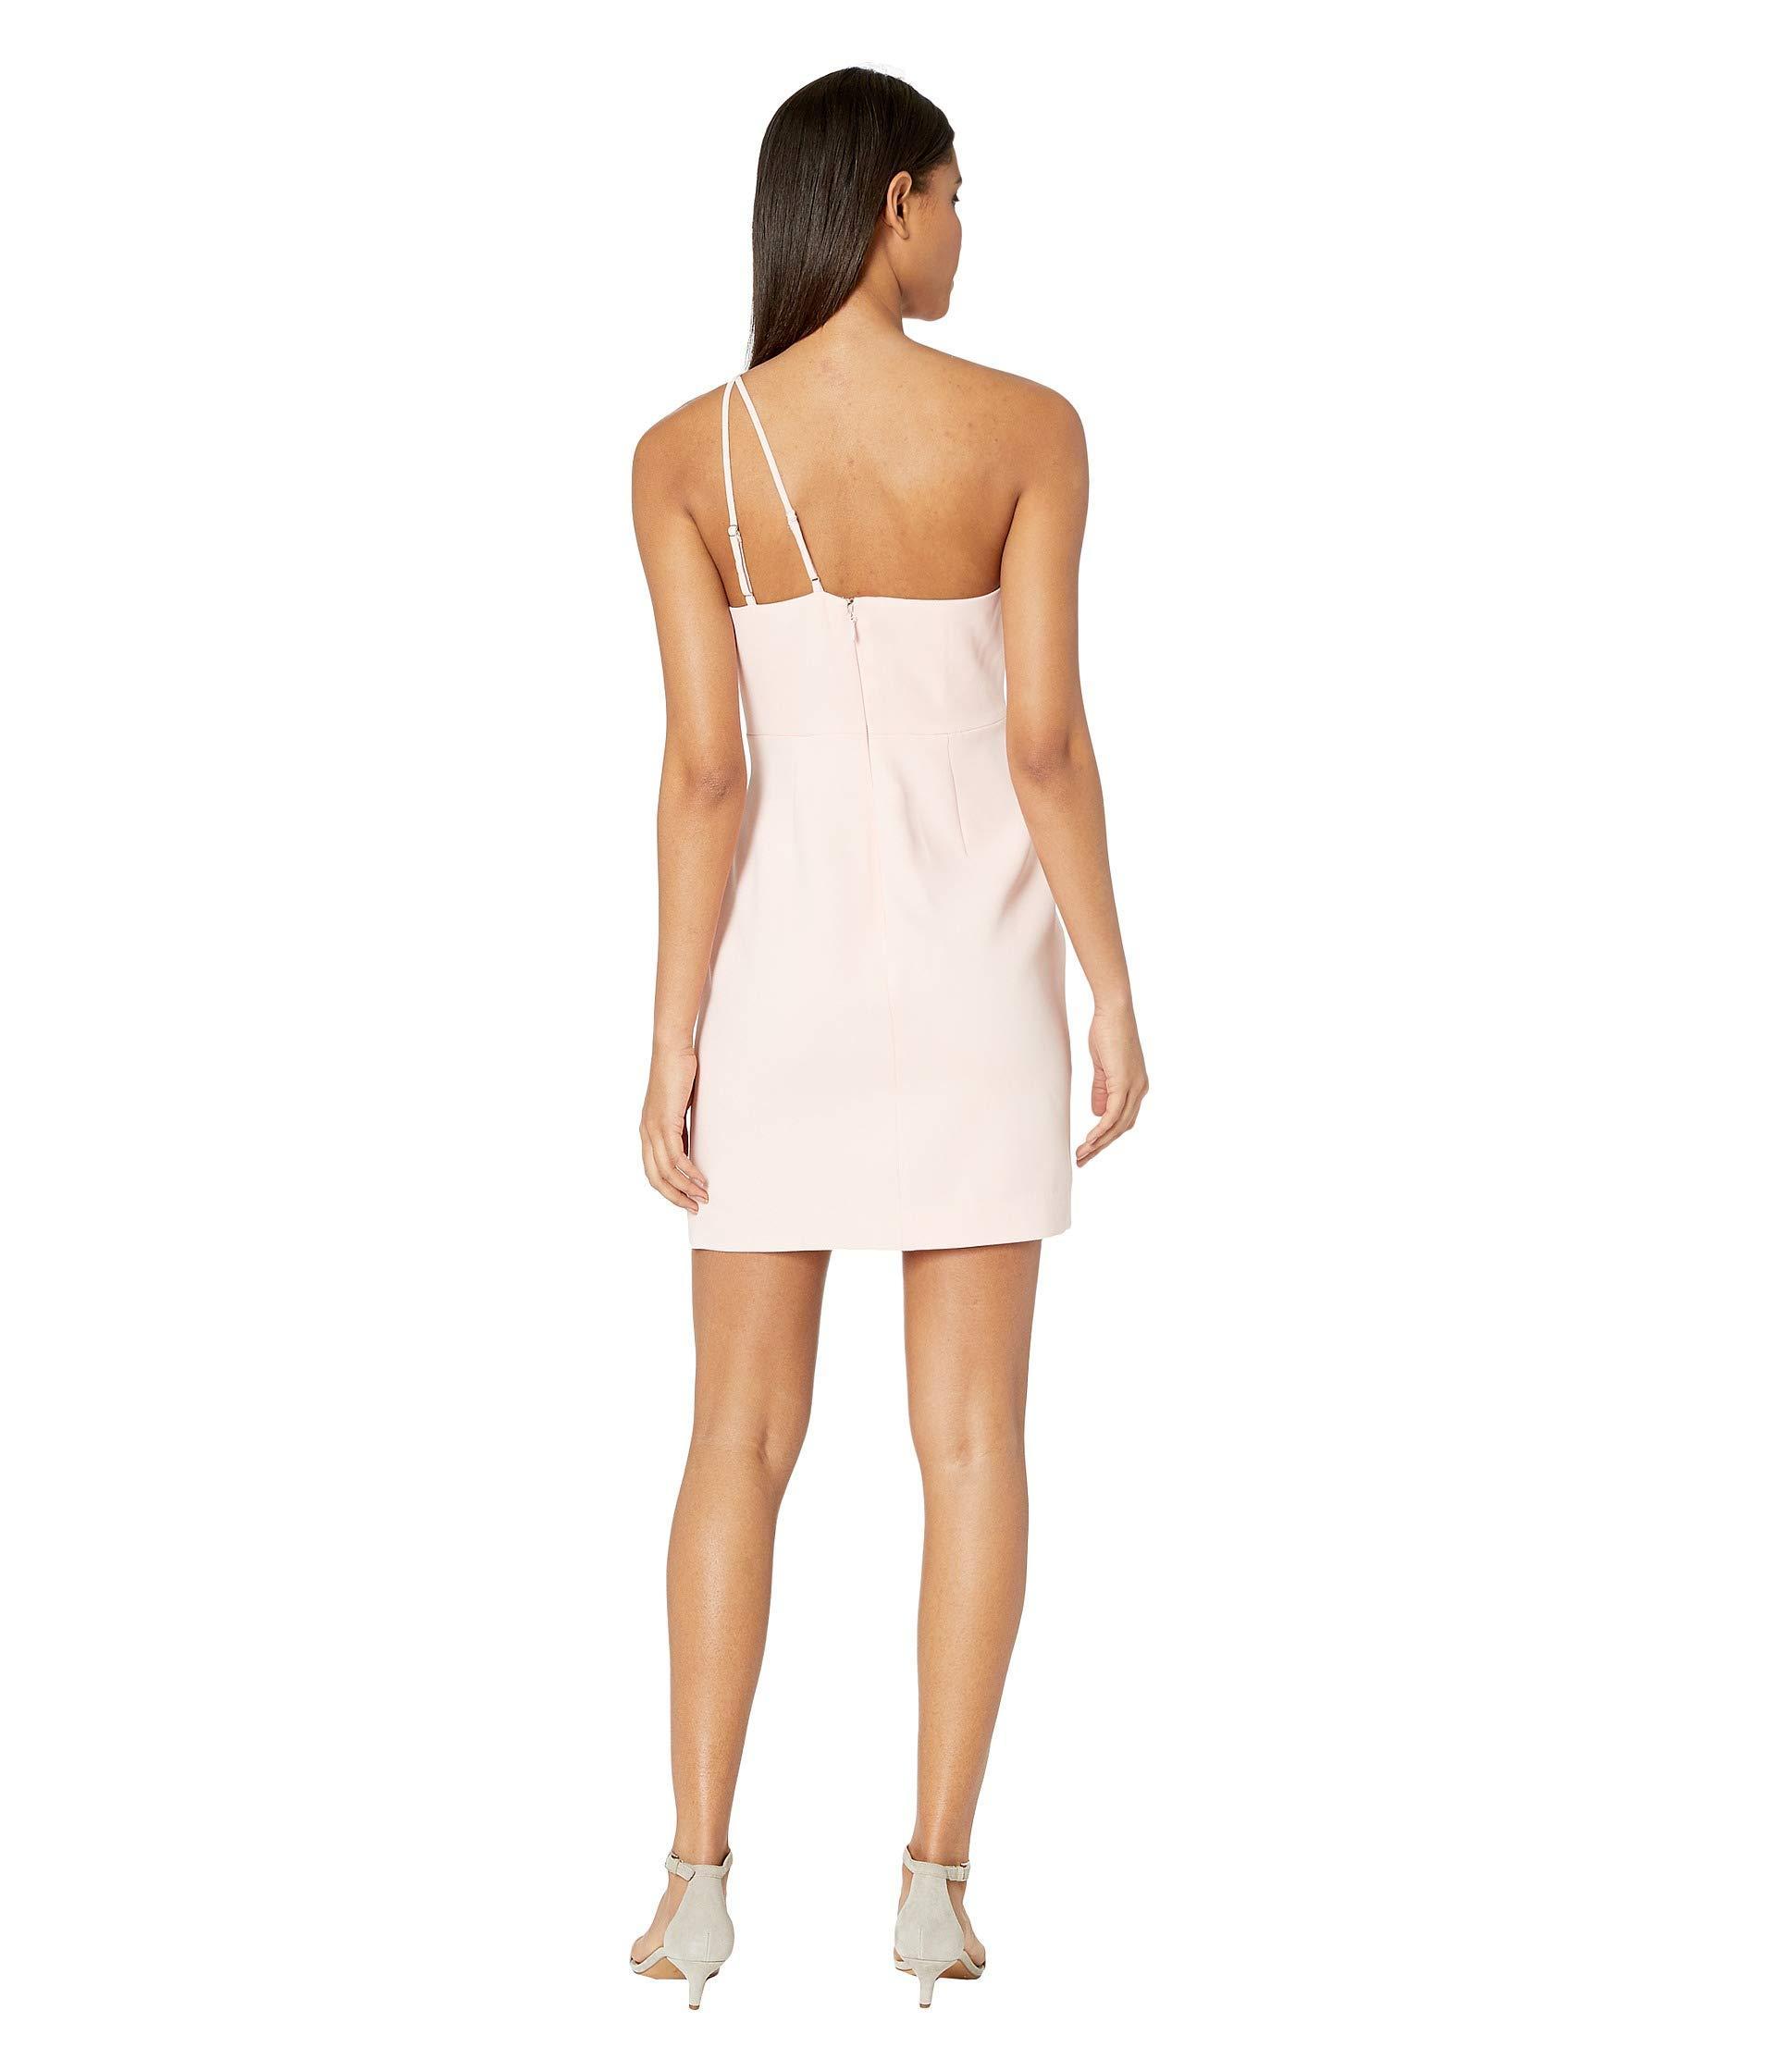 75be764a3e39 BCBGMAXAZRIA - White One Shoulder Cut Out Short Cocktail Dress (soft Petal) Women's  Dress. View fullscreen